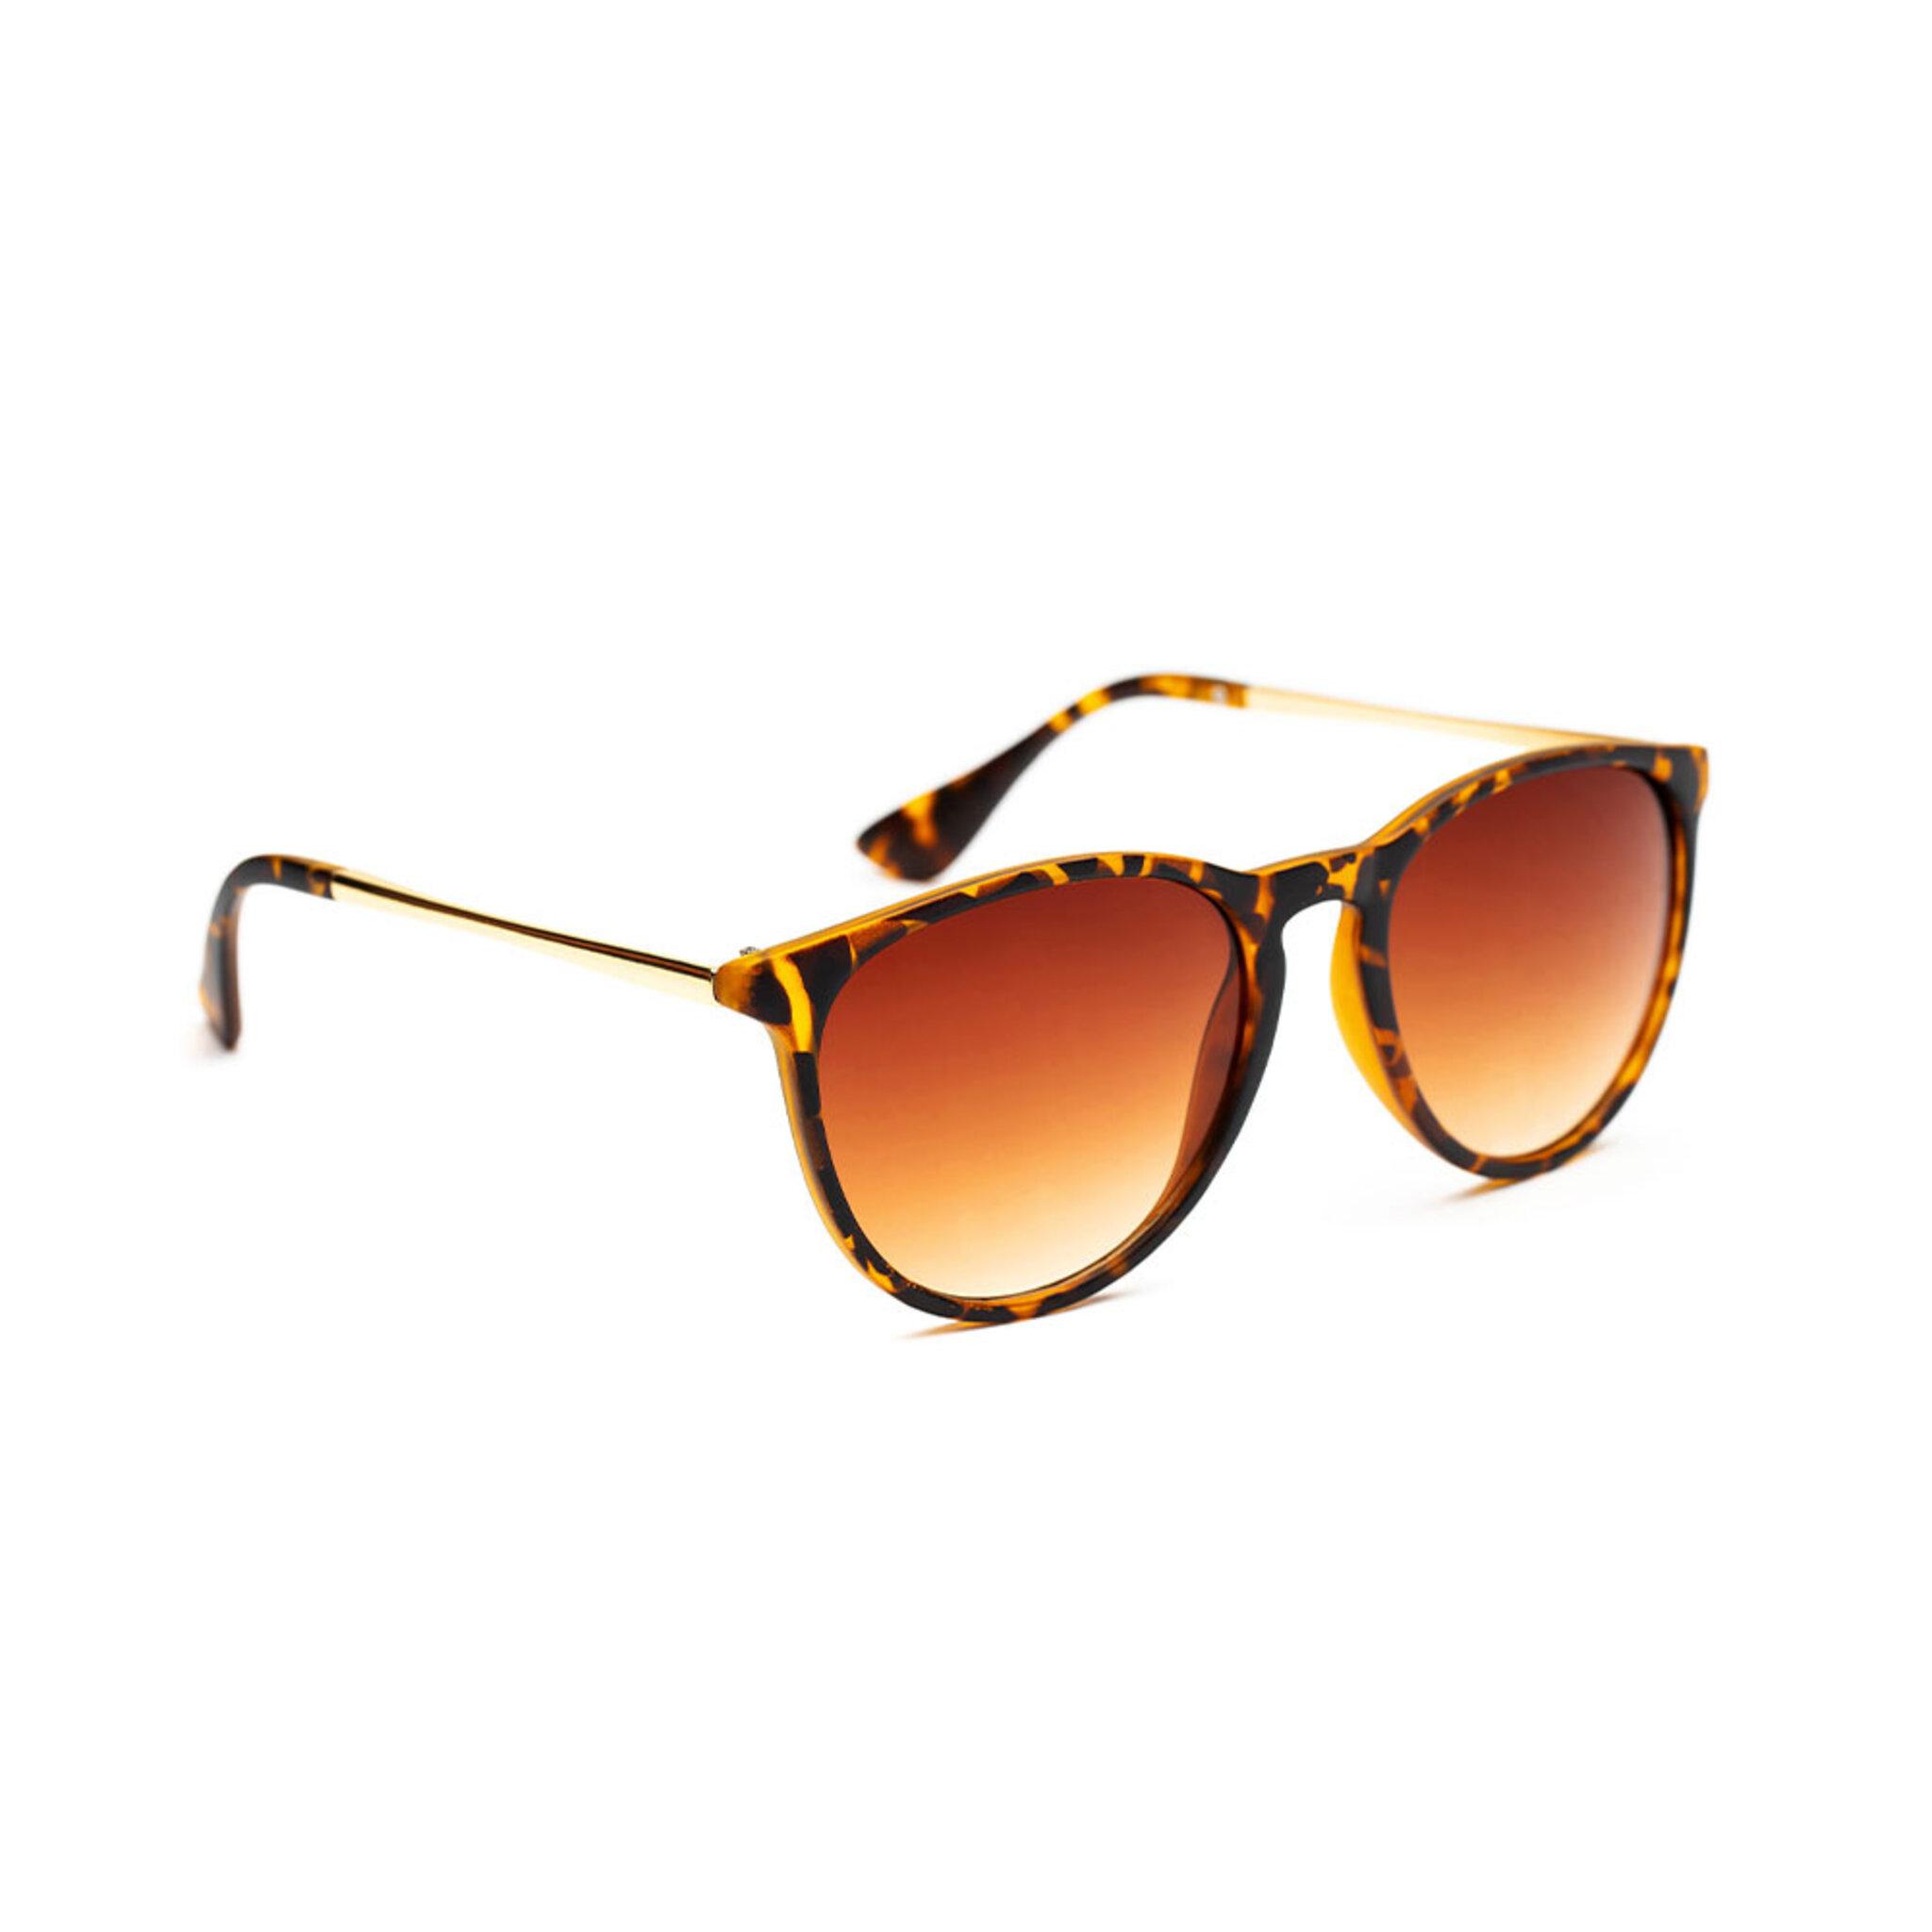 Miley solglasögon, ONE SIZE